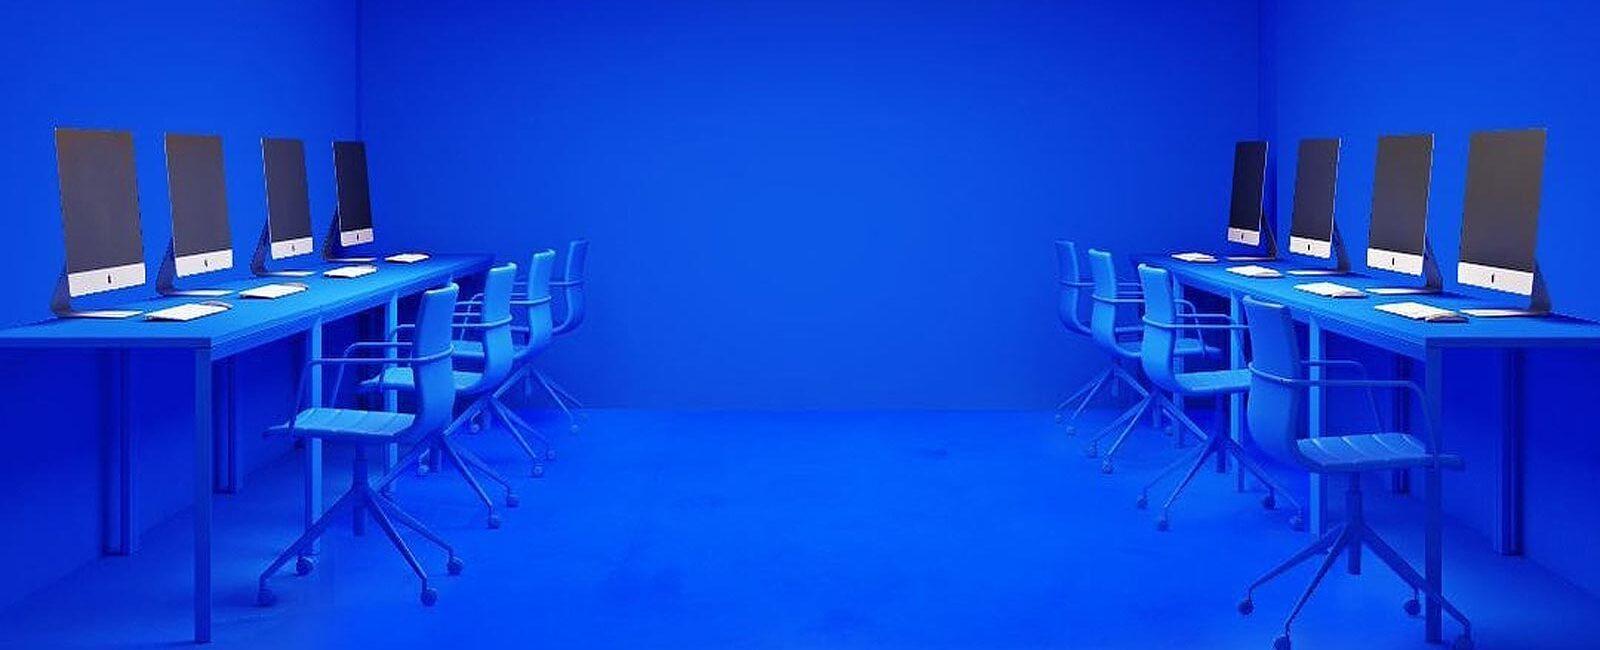 New trend: the Klein Blue